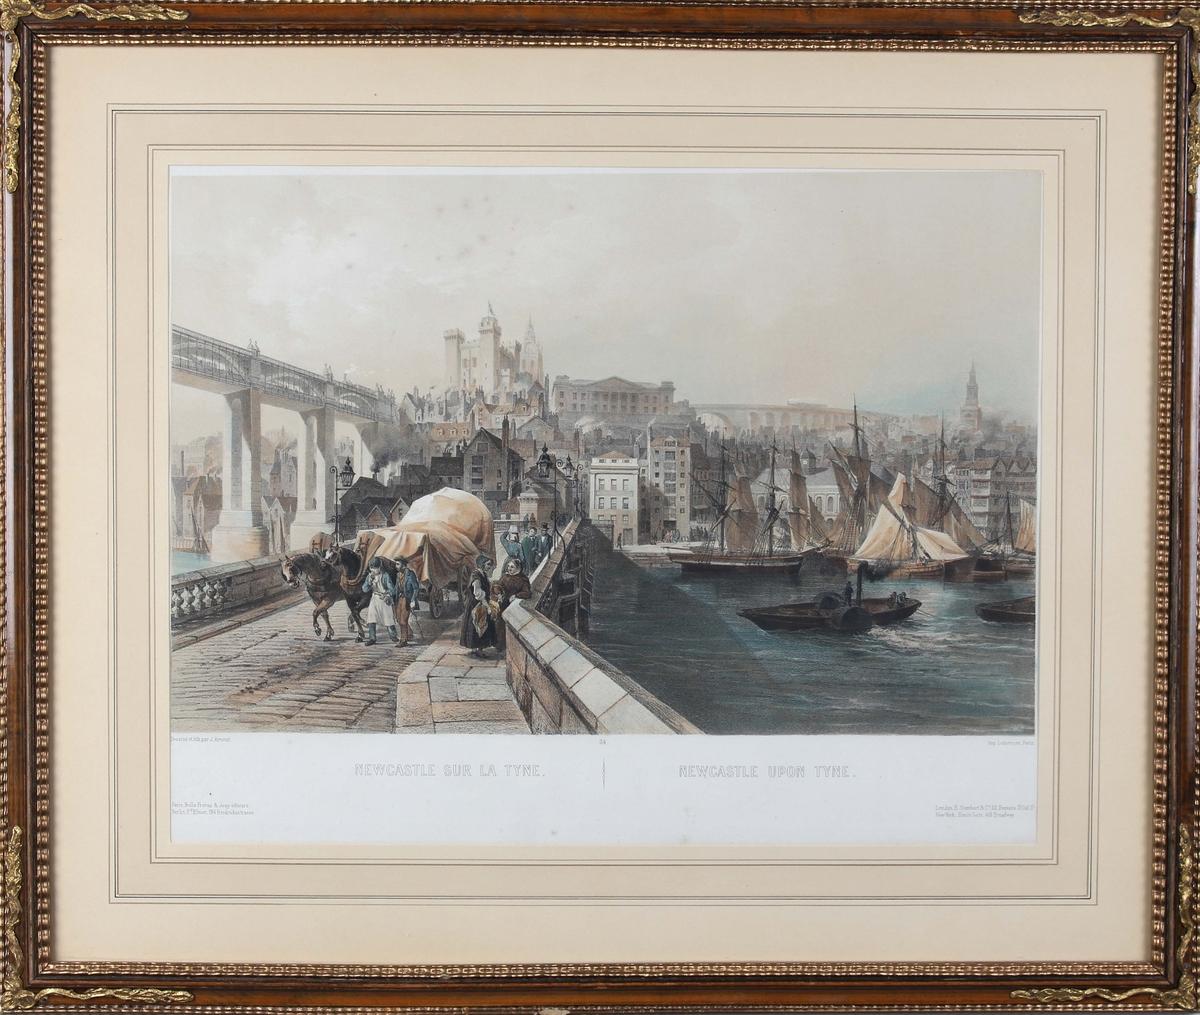 Trykk fra havnen i Newcastl, Tyne. Ser hest og vogn på en bro samt seilskip og hjuldamper i havnen.